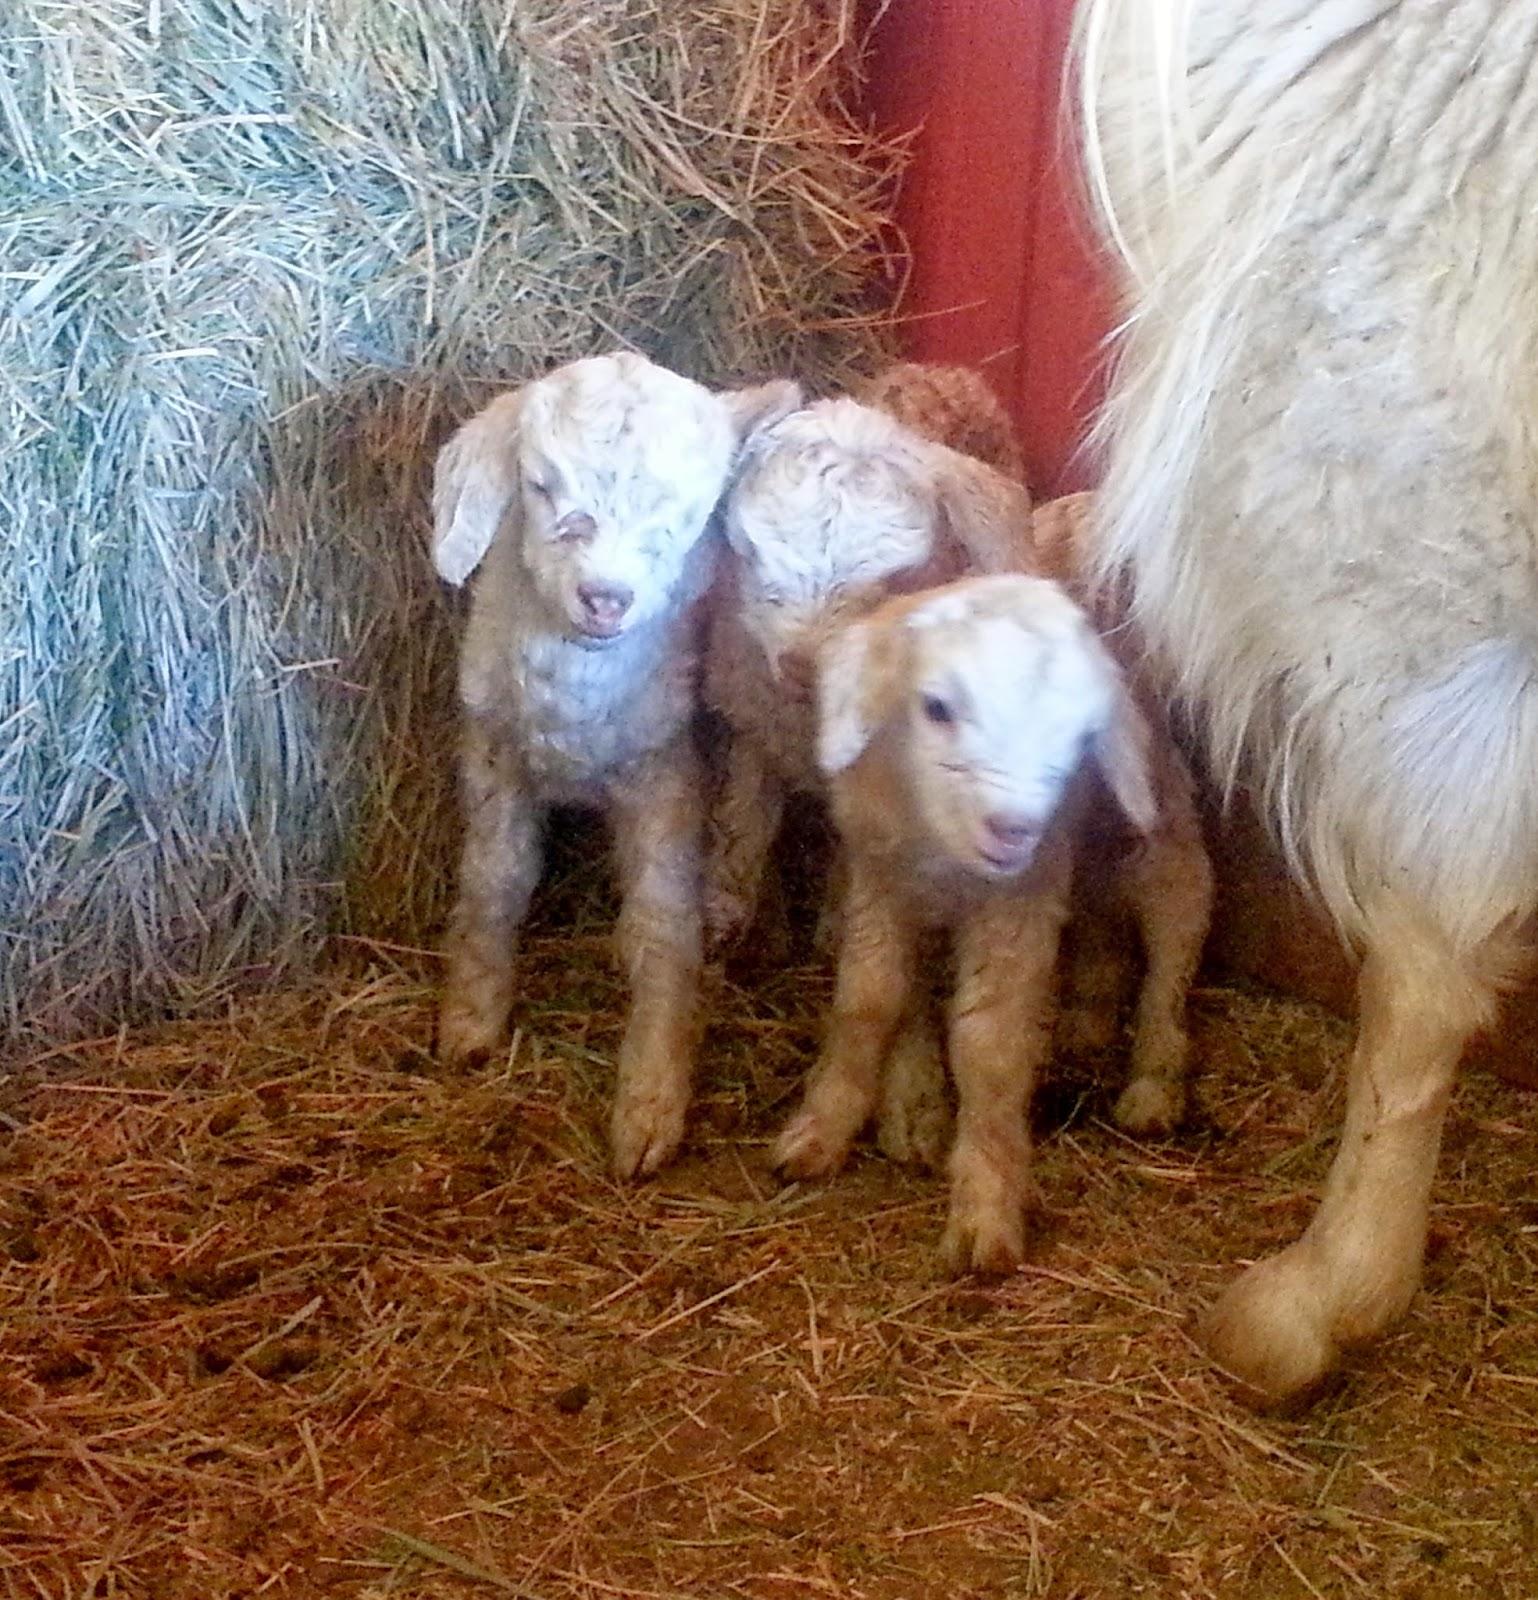 Baby cashmere goat - photo#20